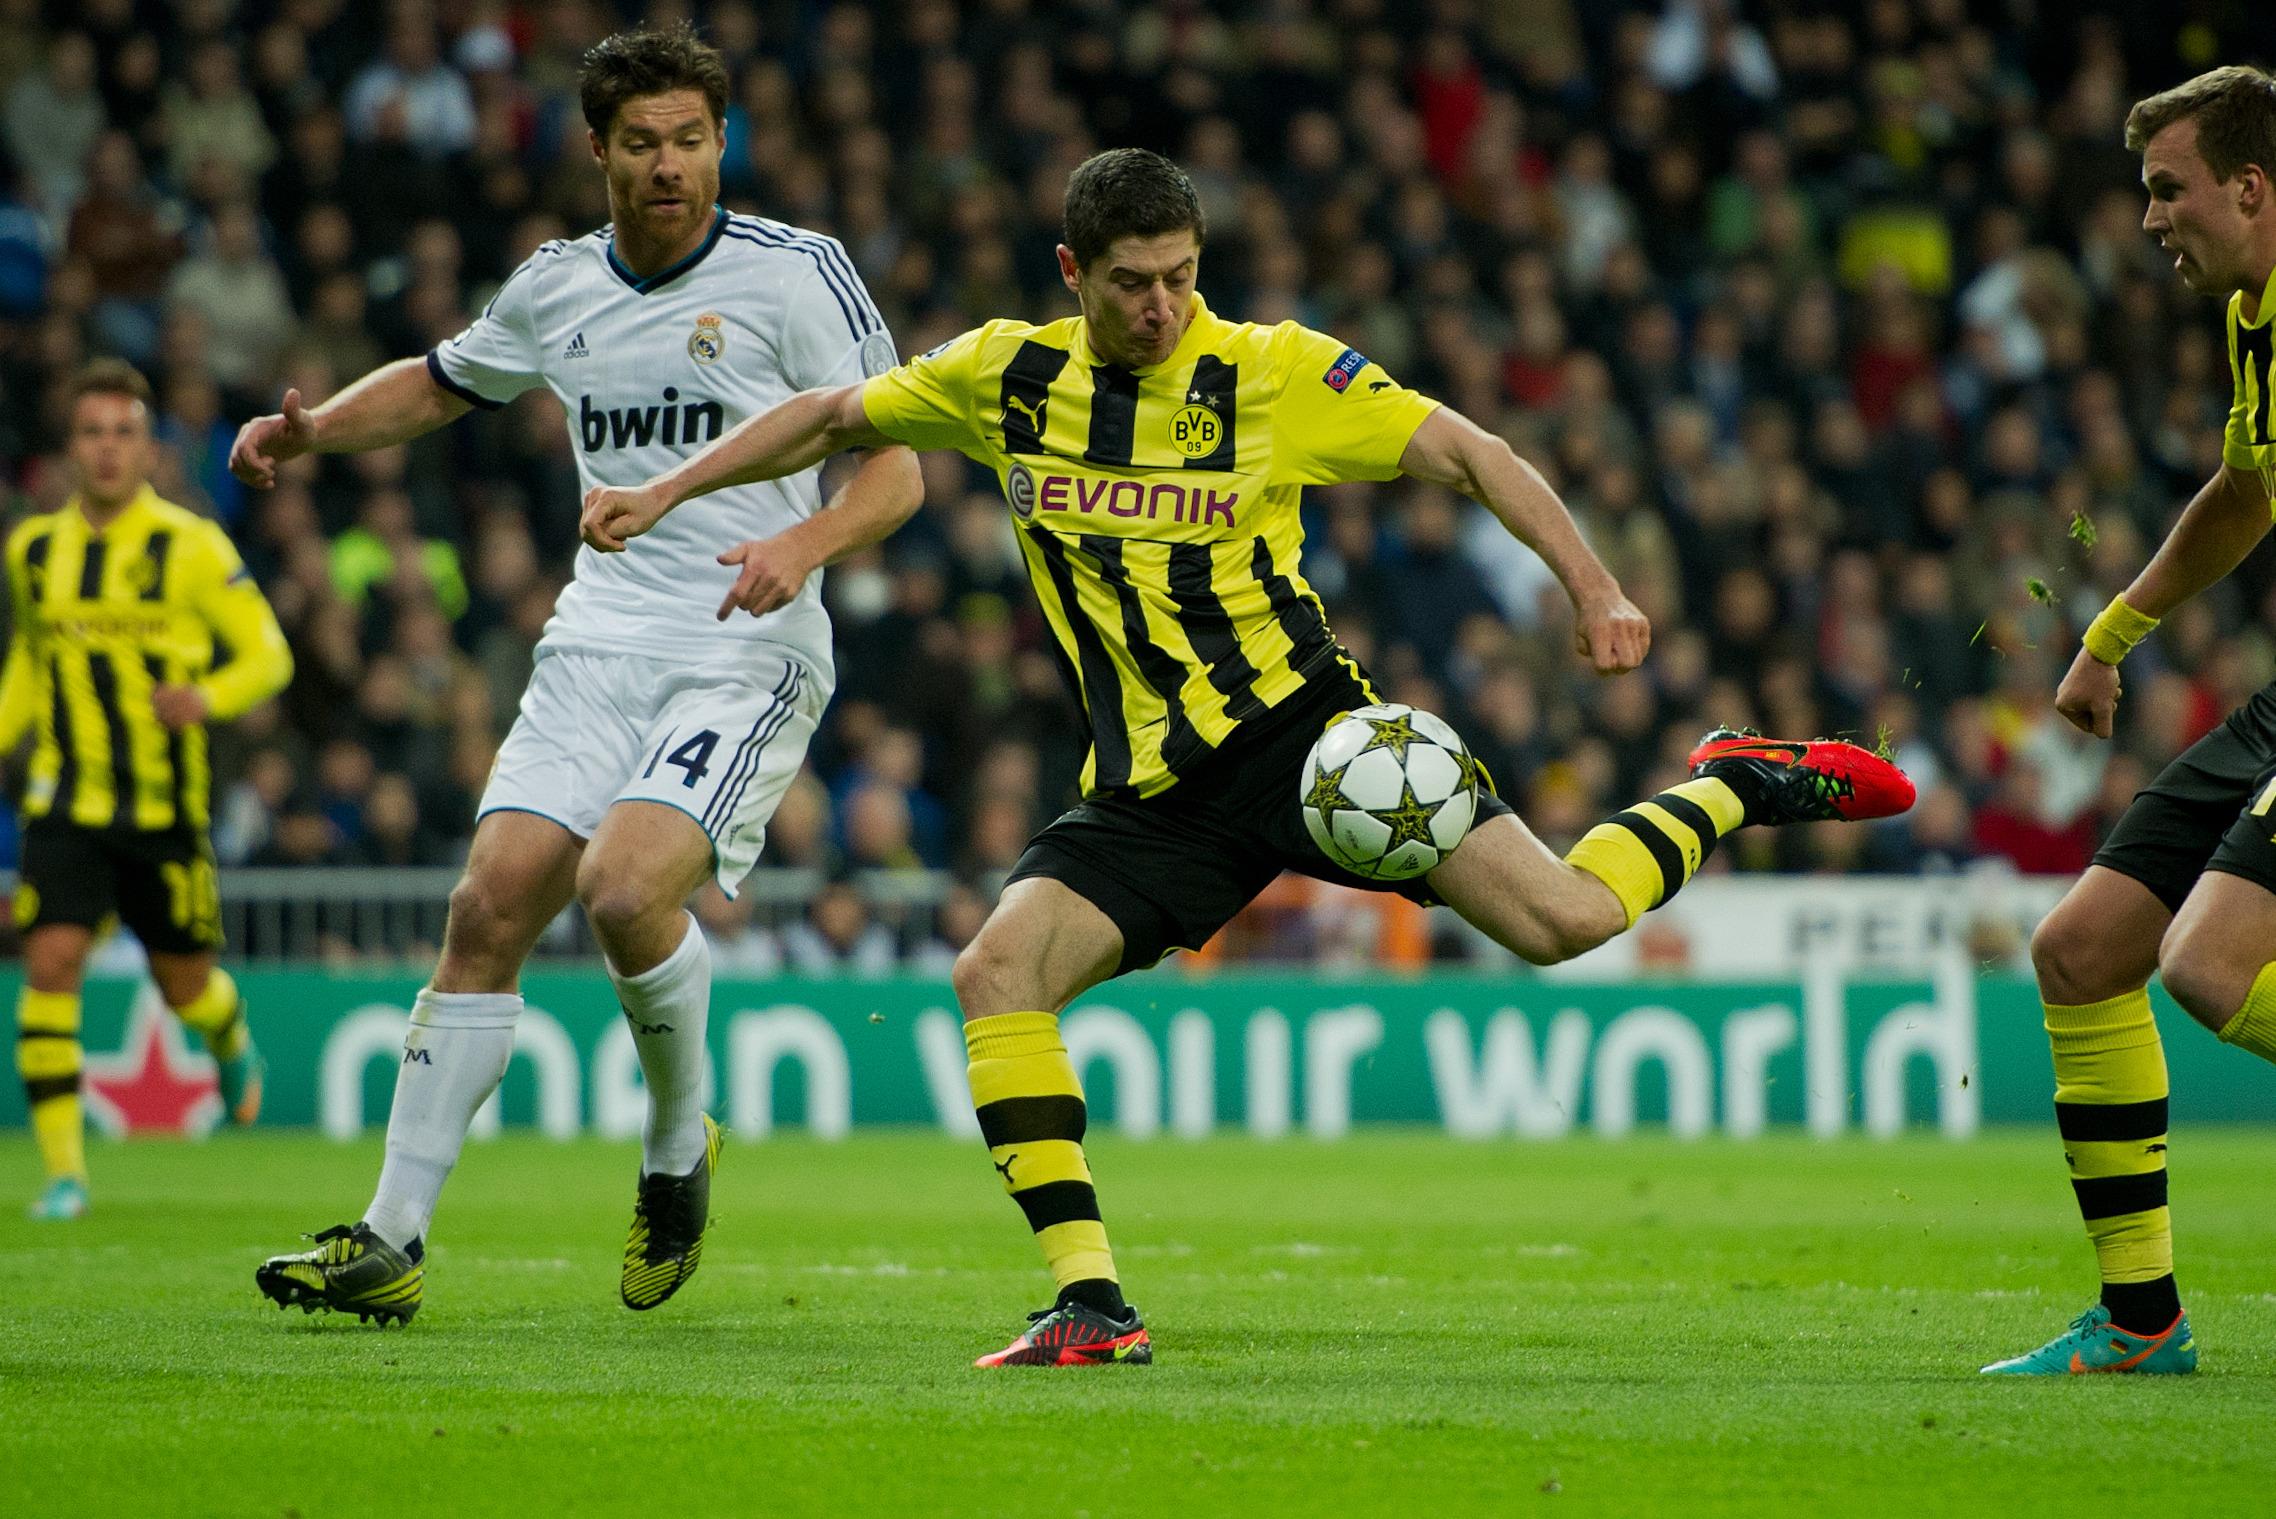 Manchester United Transfer News: Robert Lewandowski to Sign